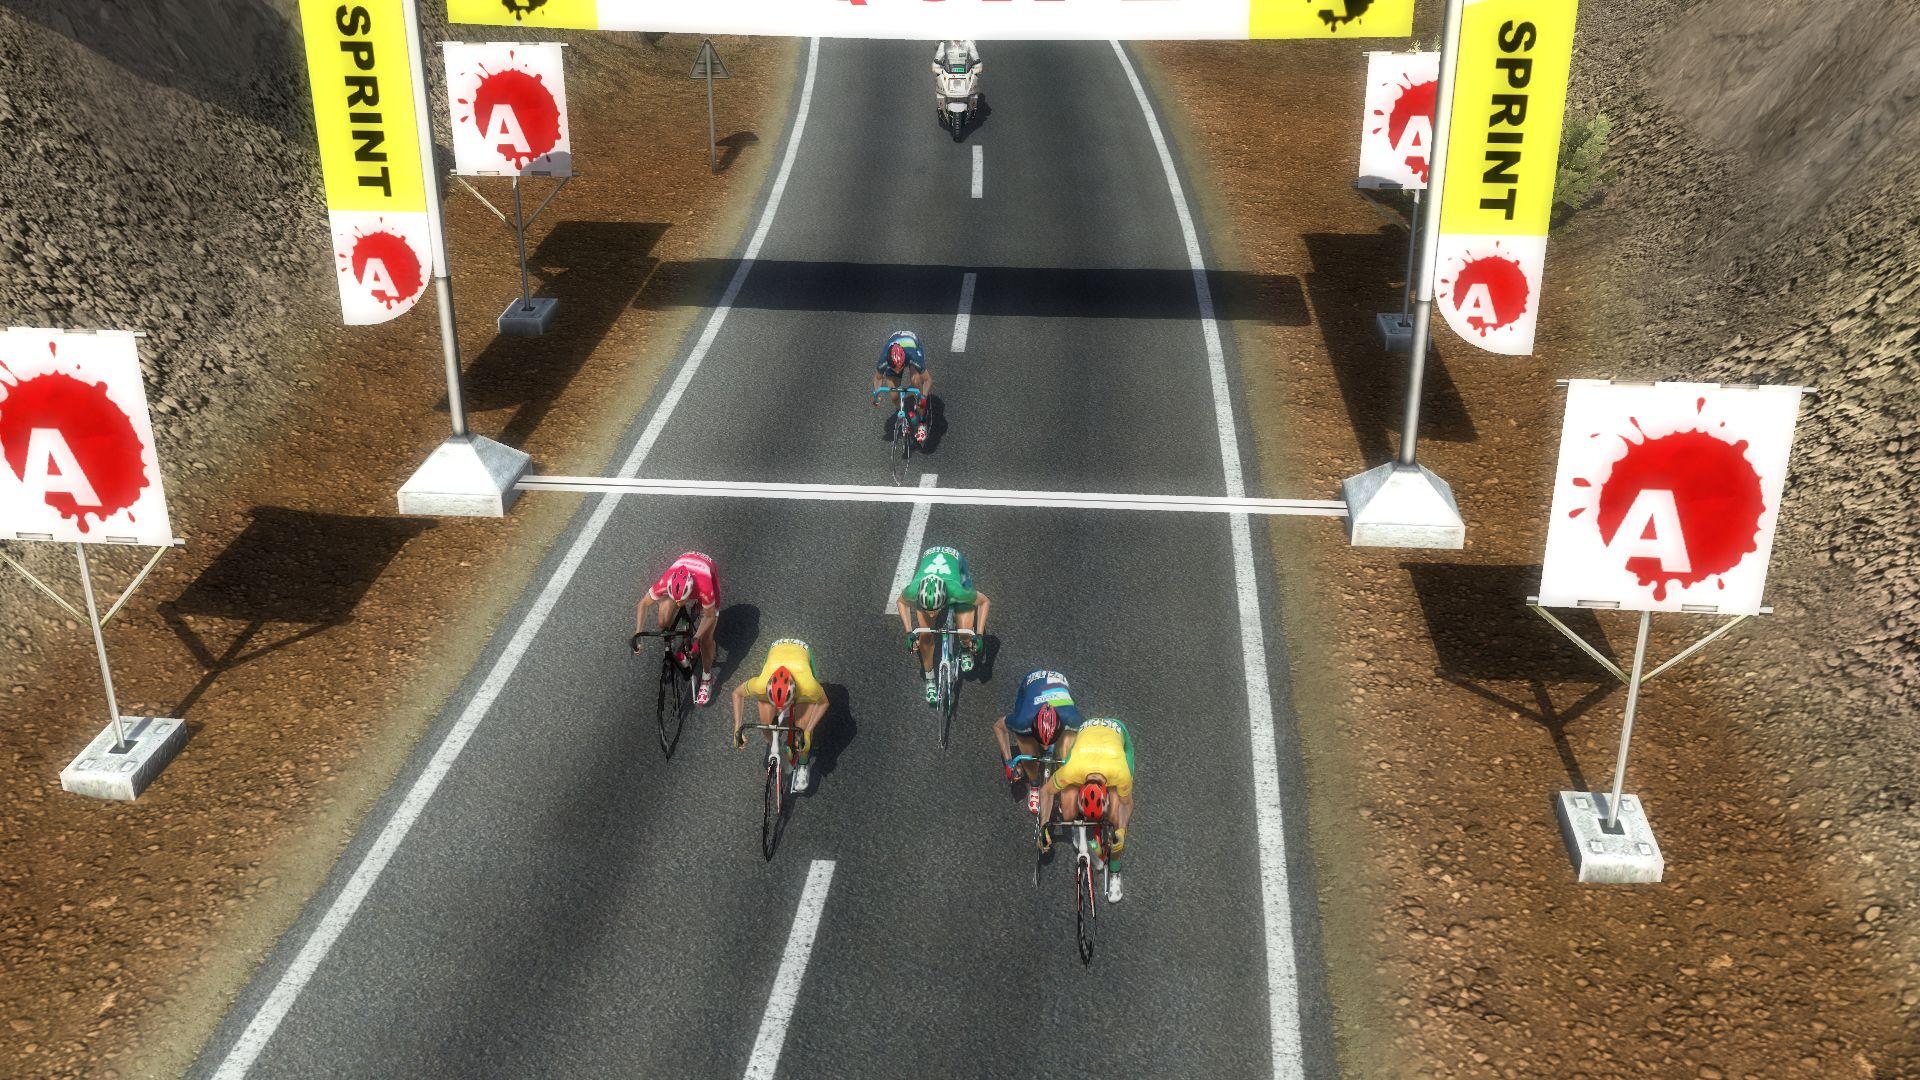 pcmdaily.com/images/mg/2019/Races/PTHC/East%20Java/JavaS1%204.jpg